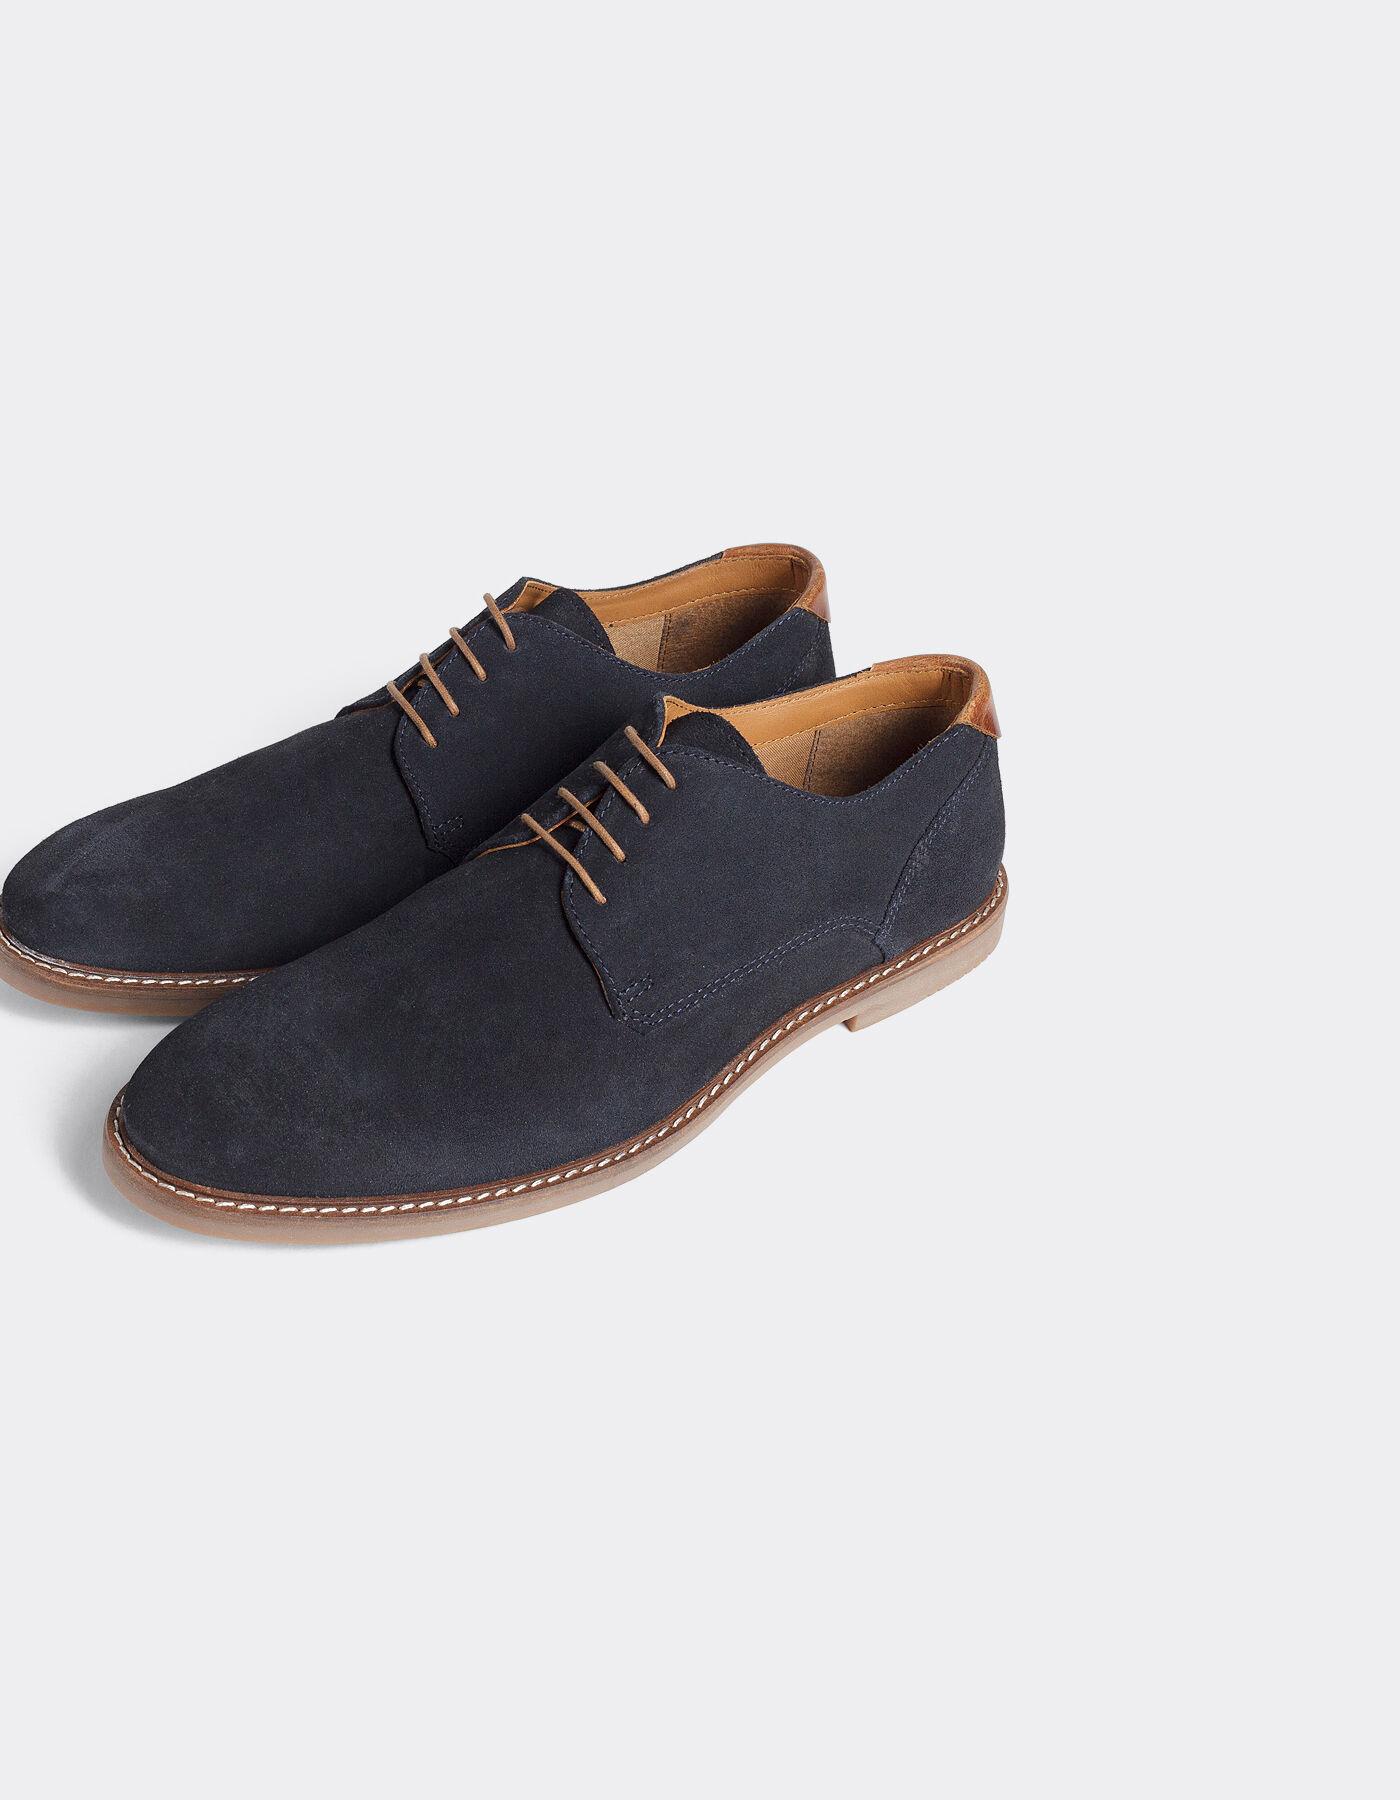 chaussure derby su d semelle contrast e bleu marine homme jules. Black Bedroom Furniture Sets. Home Design Ideas